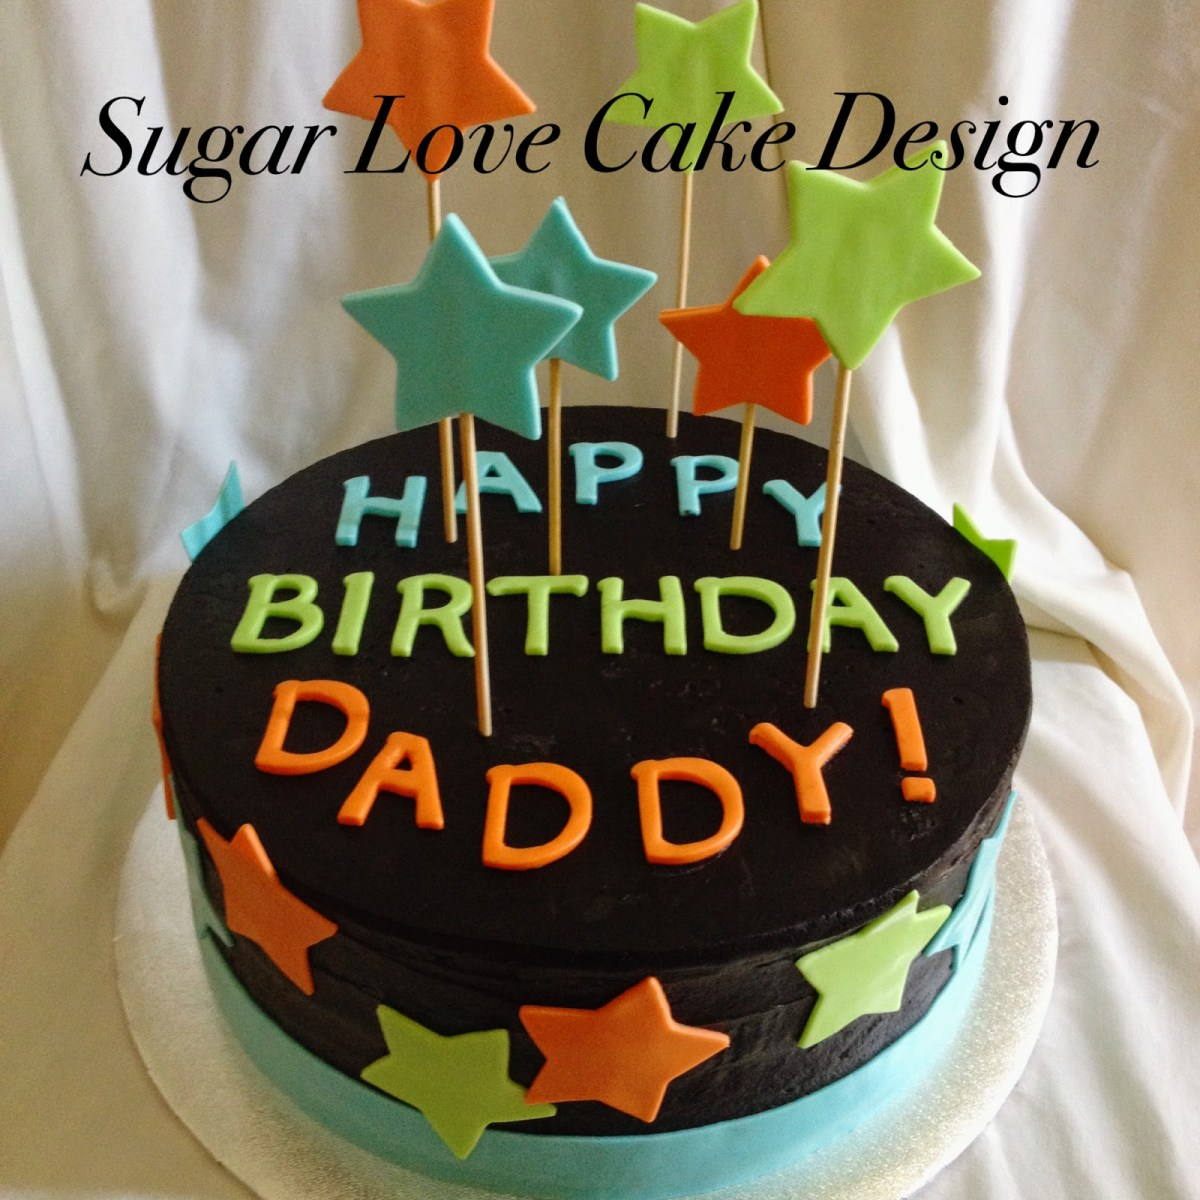 Incredible Birthday Cakes For Dad Sugar Love Cake Design Stars Birijus Com Birthday Cards Printable Benkemecafe Filternl